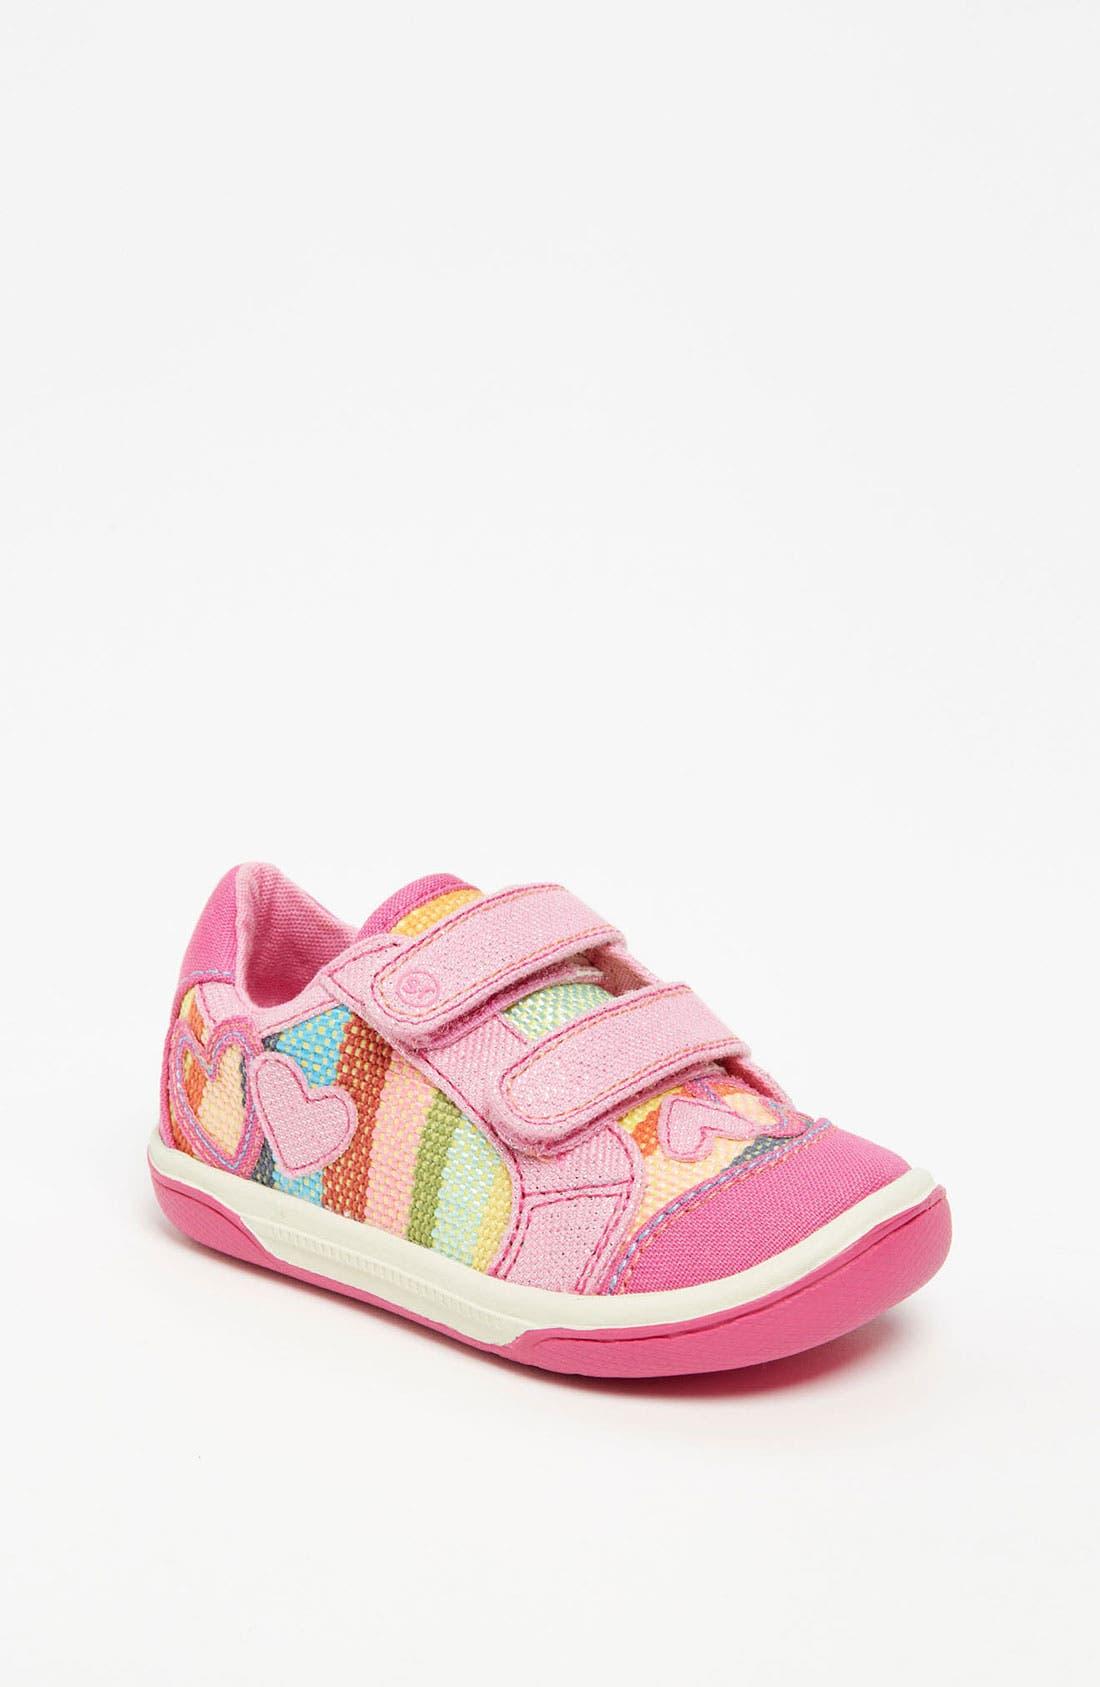 Main Image - Stride Rite 'Ryder' Sneaker (Baby, Walker & Toddler)